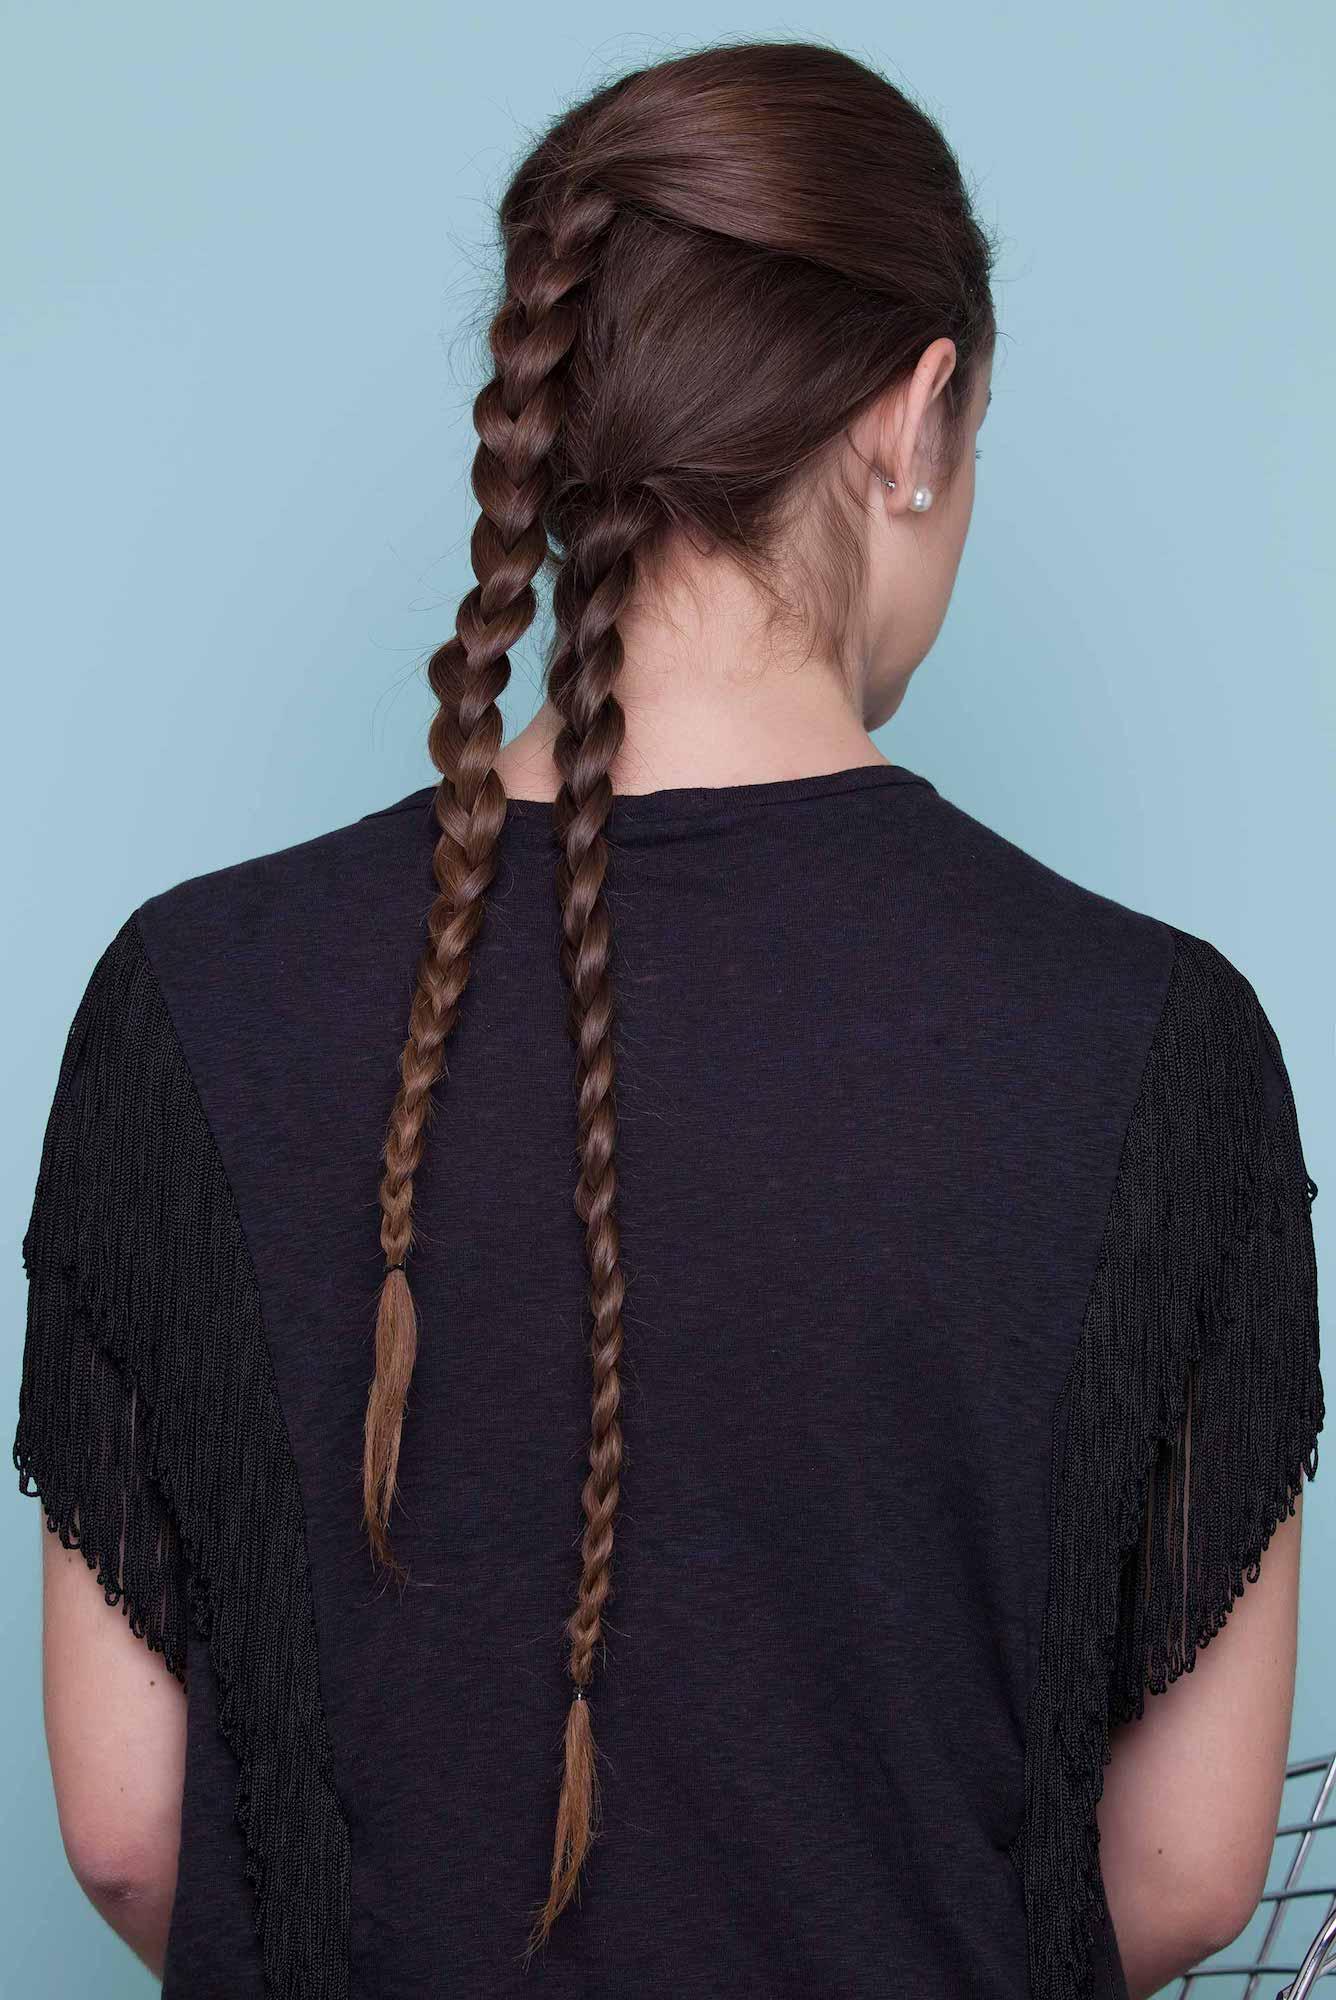 14 kepang rambut dua dengan gaya rambut panjang dikepang